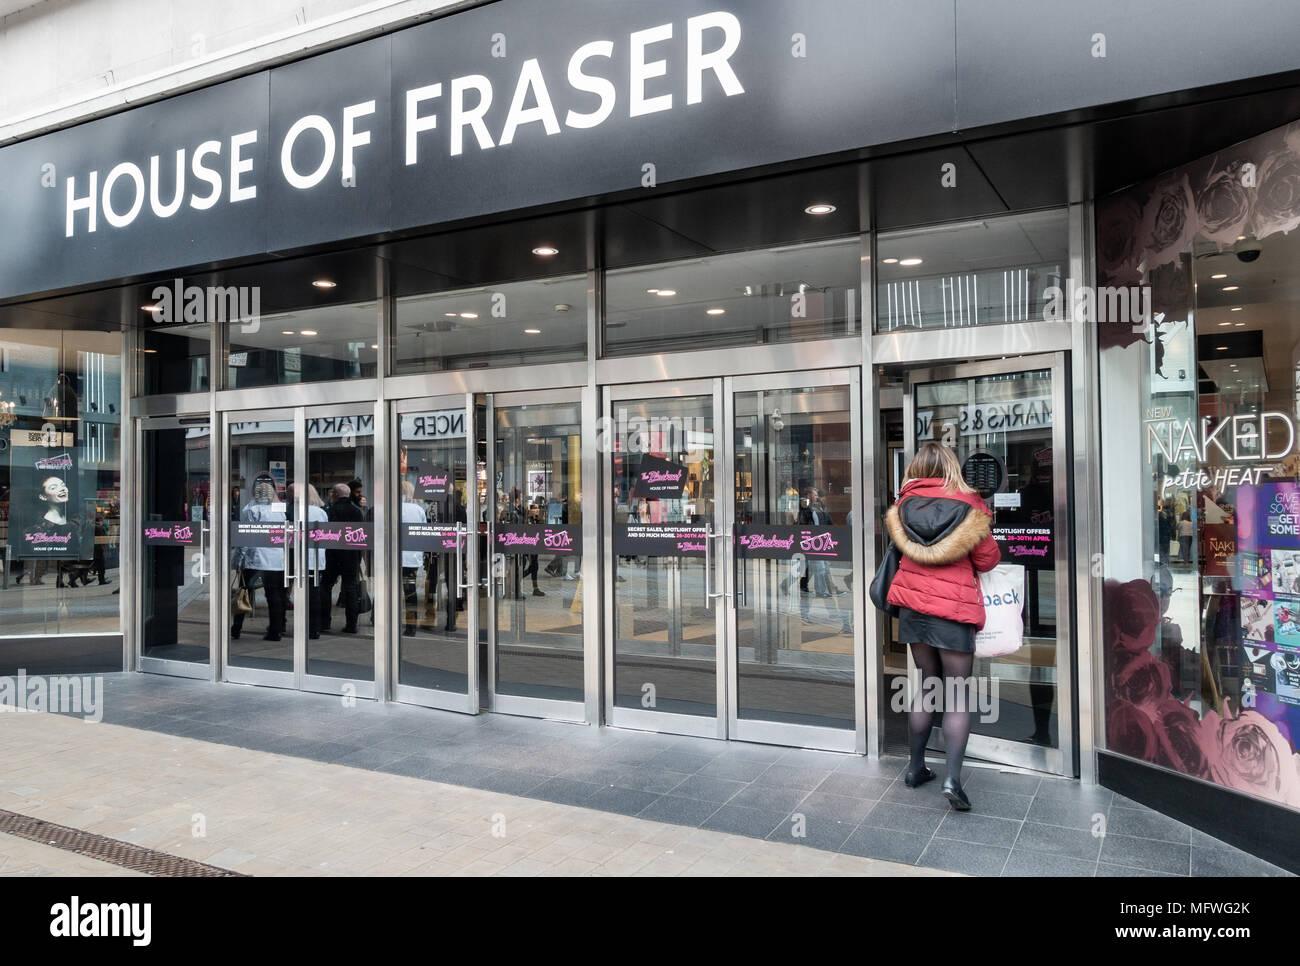 House of Fraser store, Leeds. UK - Stock Image